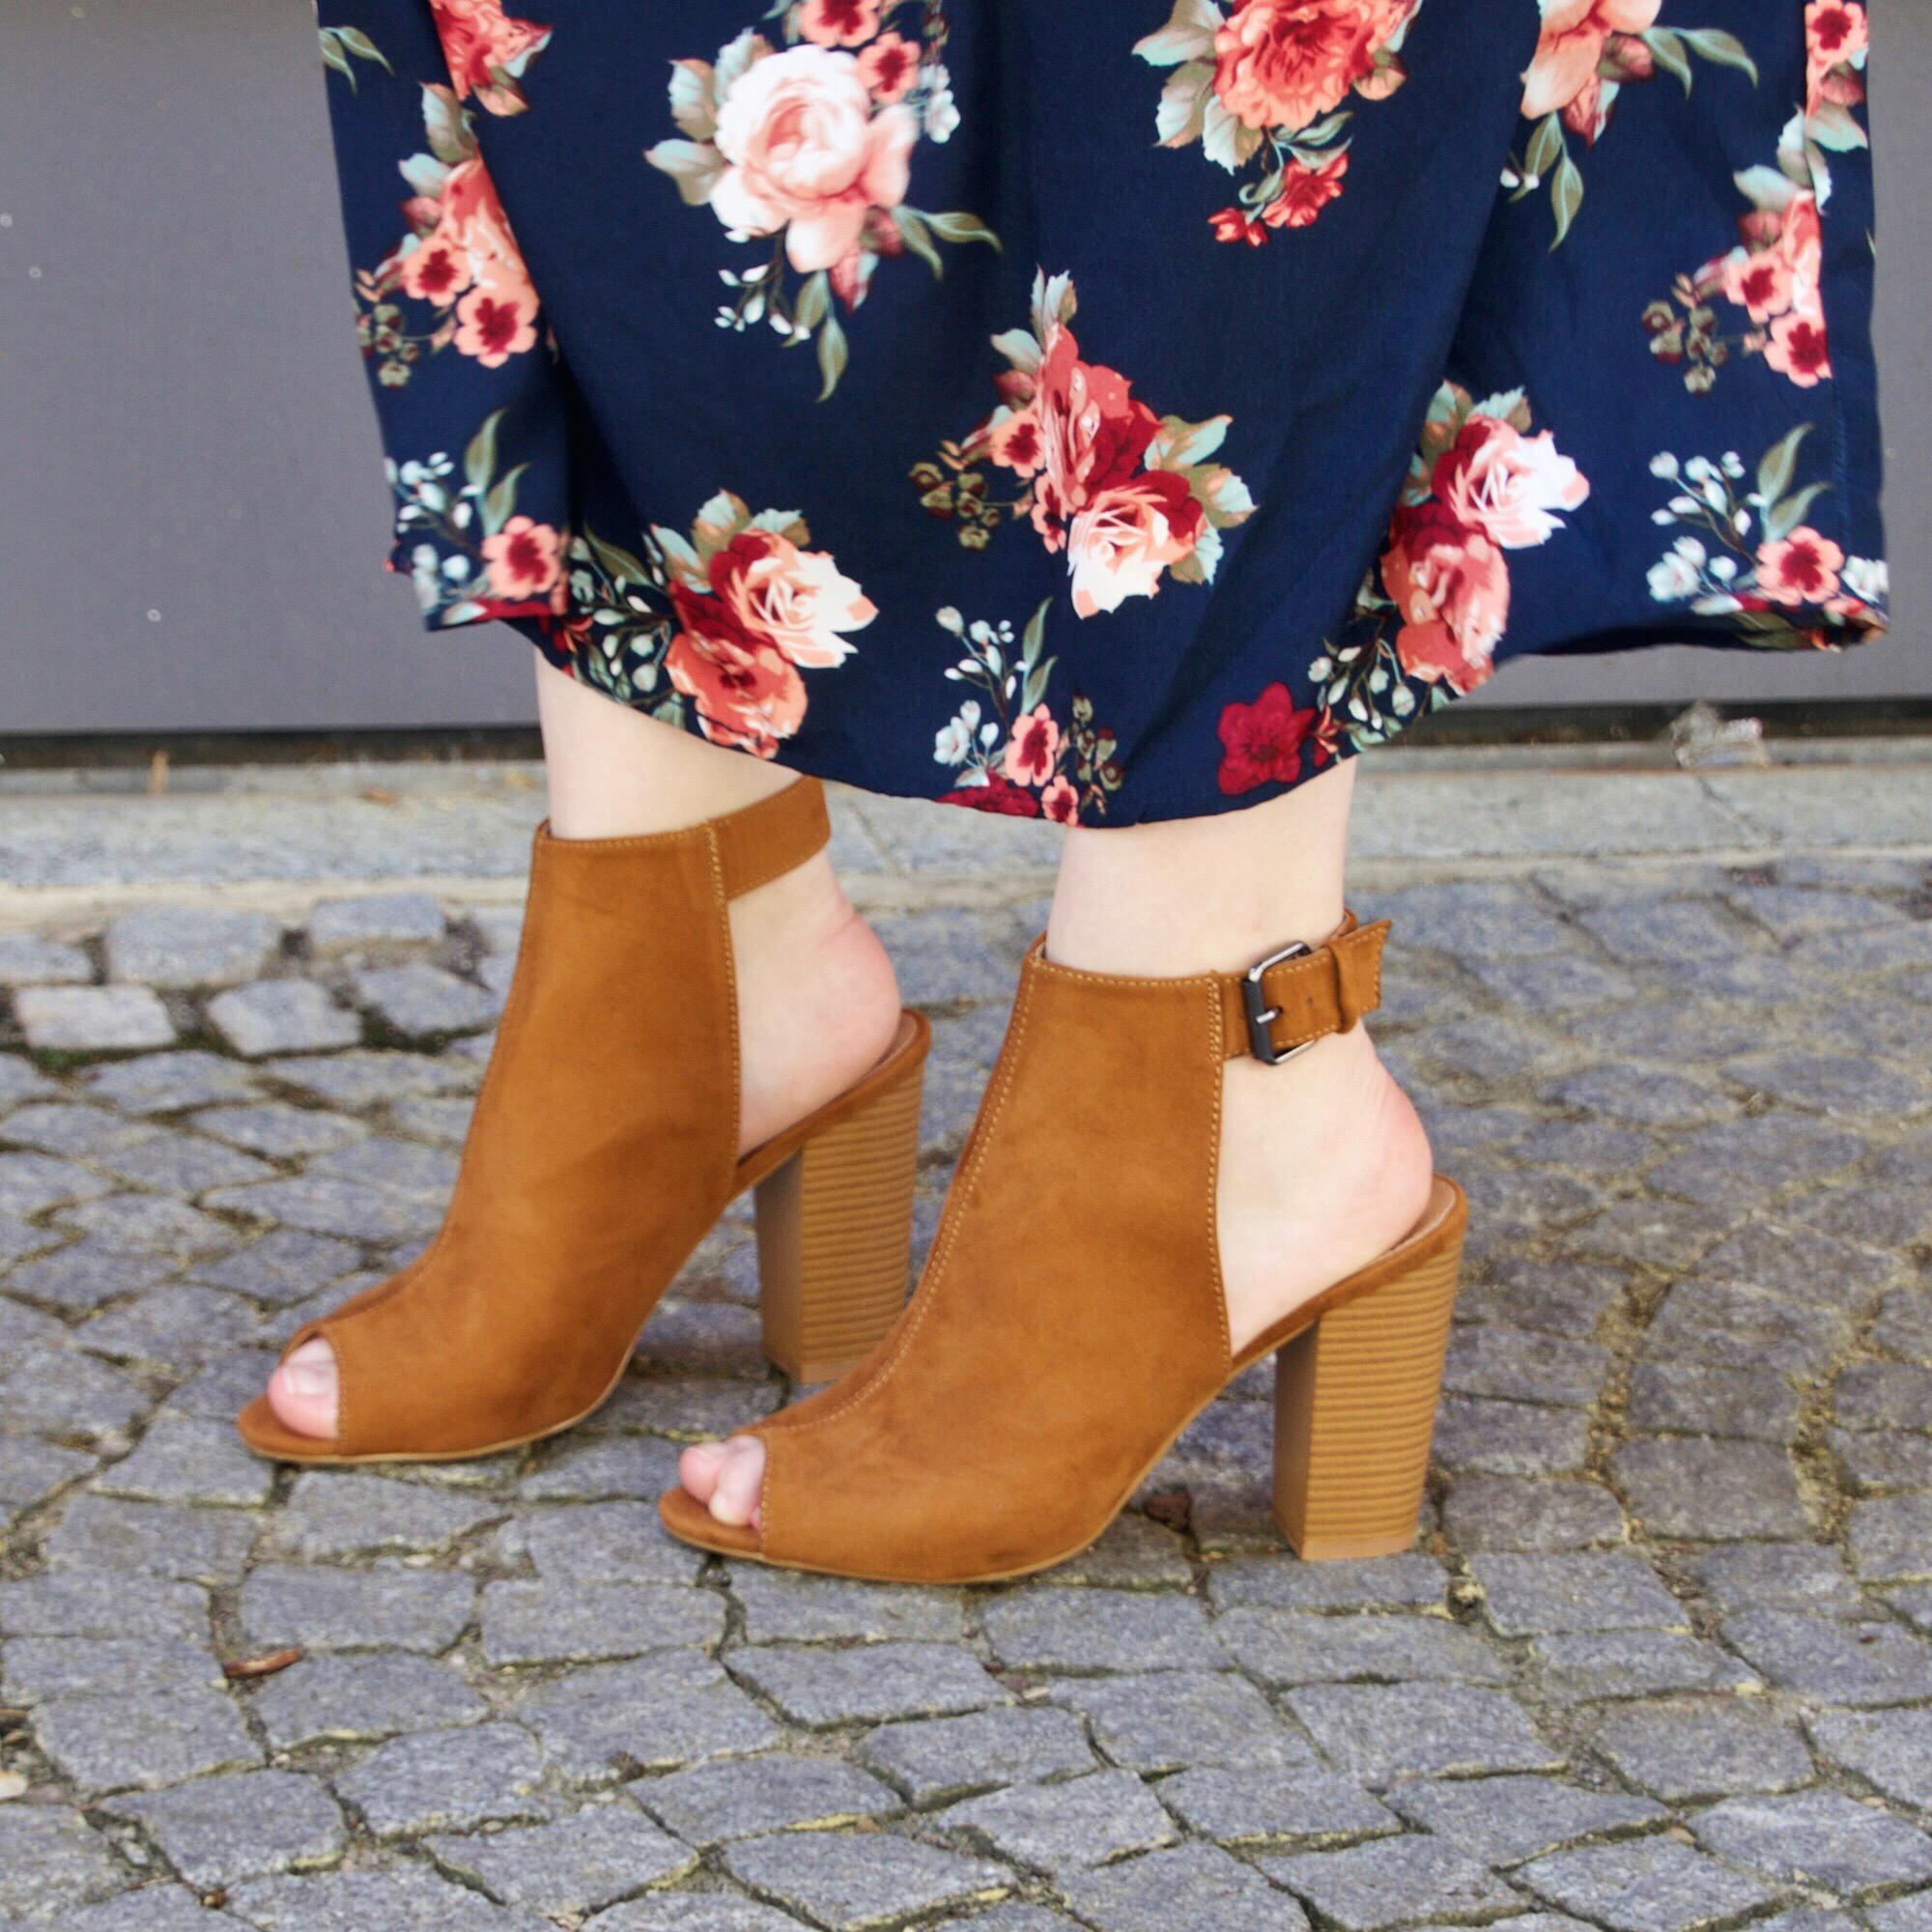 flower-dresses-this-season_2-small